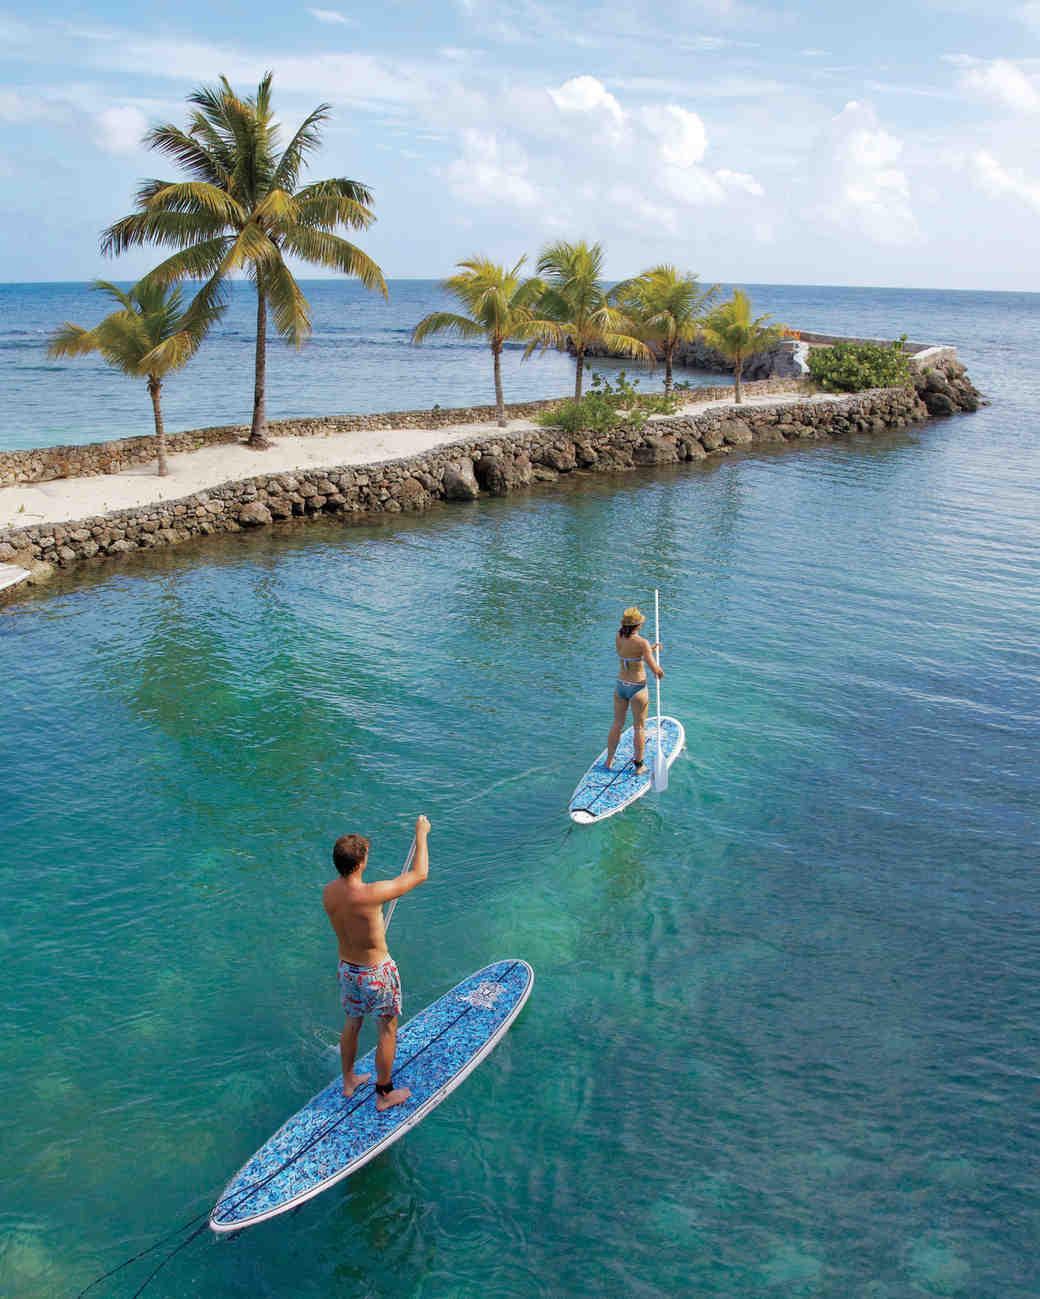 paddle-boarding-mwds108734.jpg